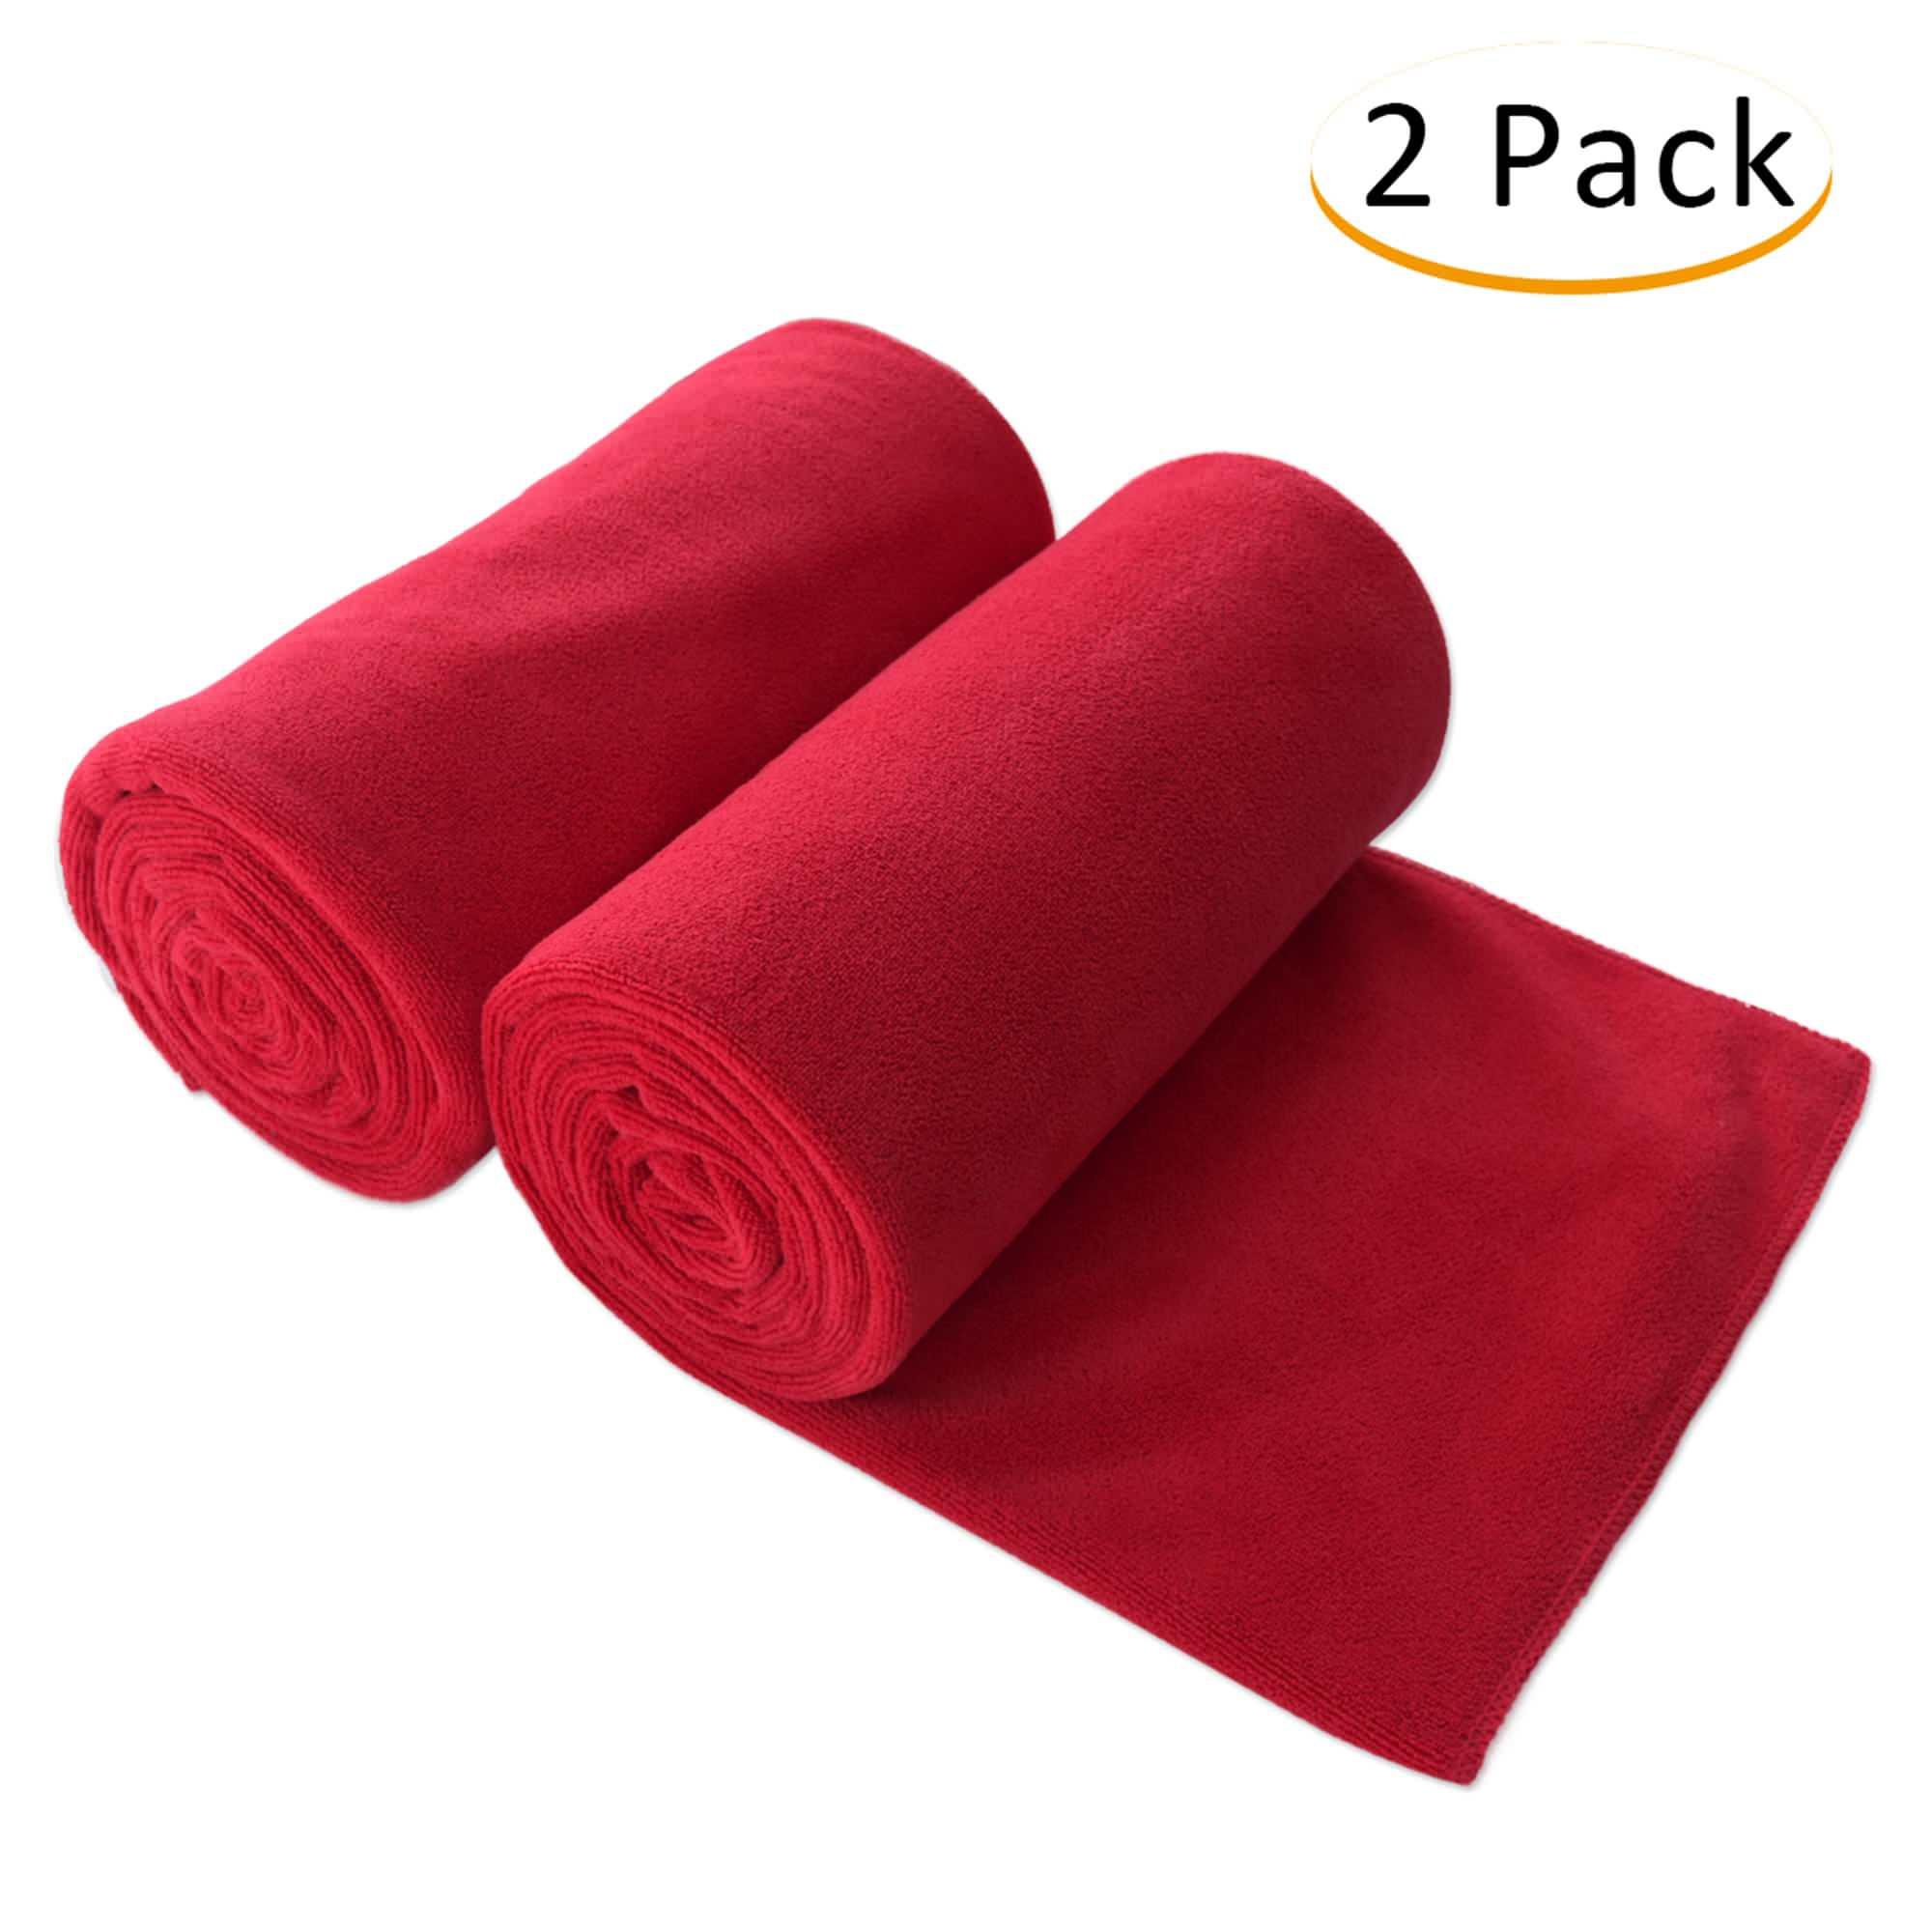 "JML Bath Towel, Microfiber 2 Pack Towel Sets (30"" x 60"") Extra Absorbent, Fast... by JML"